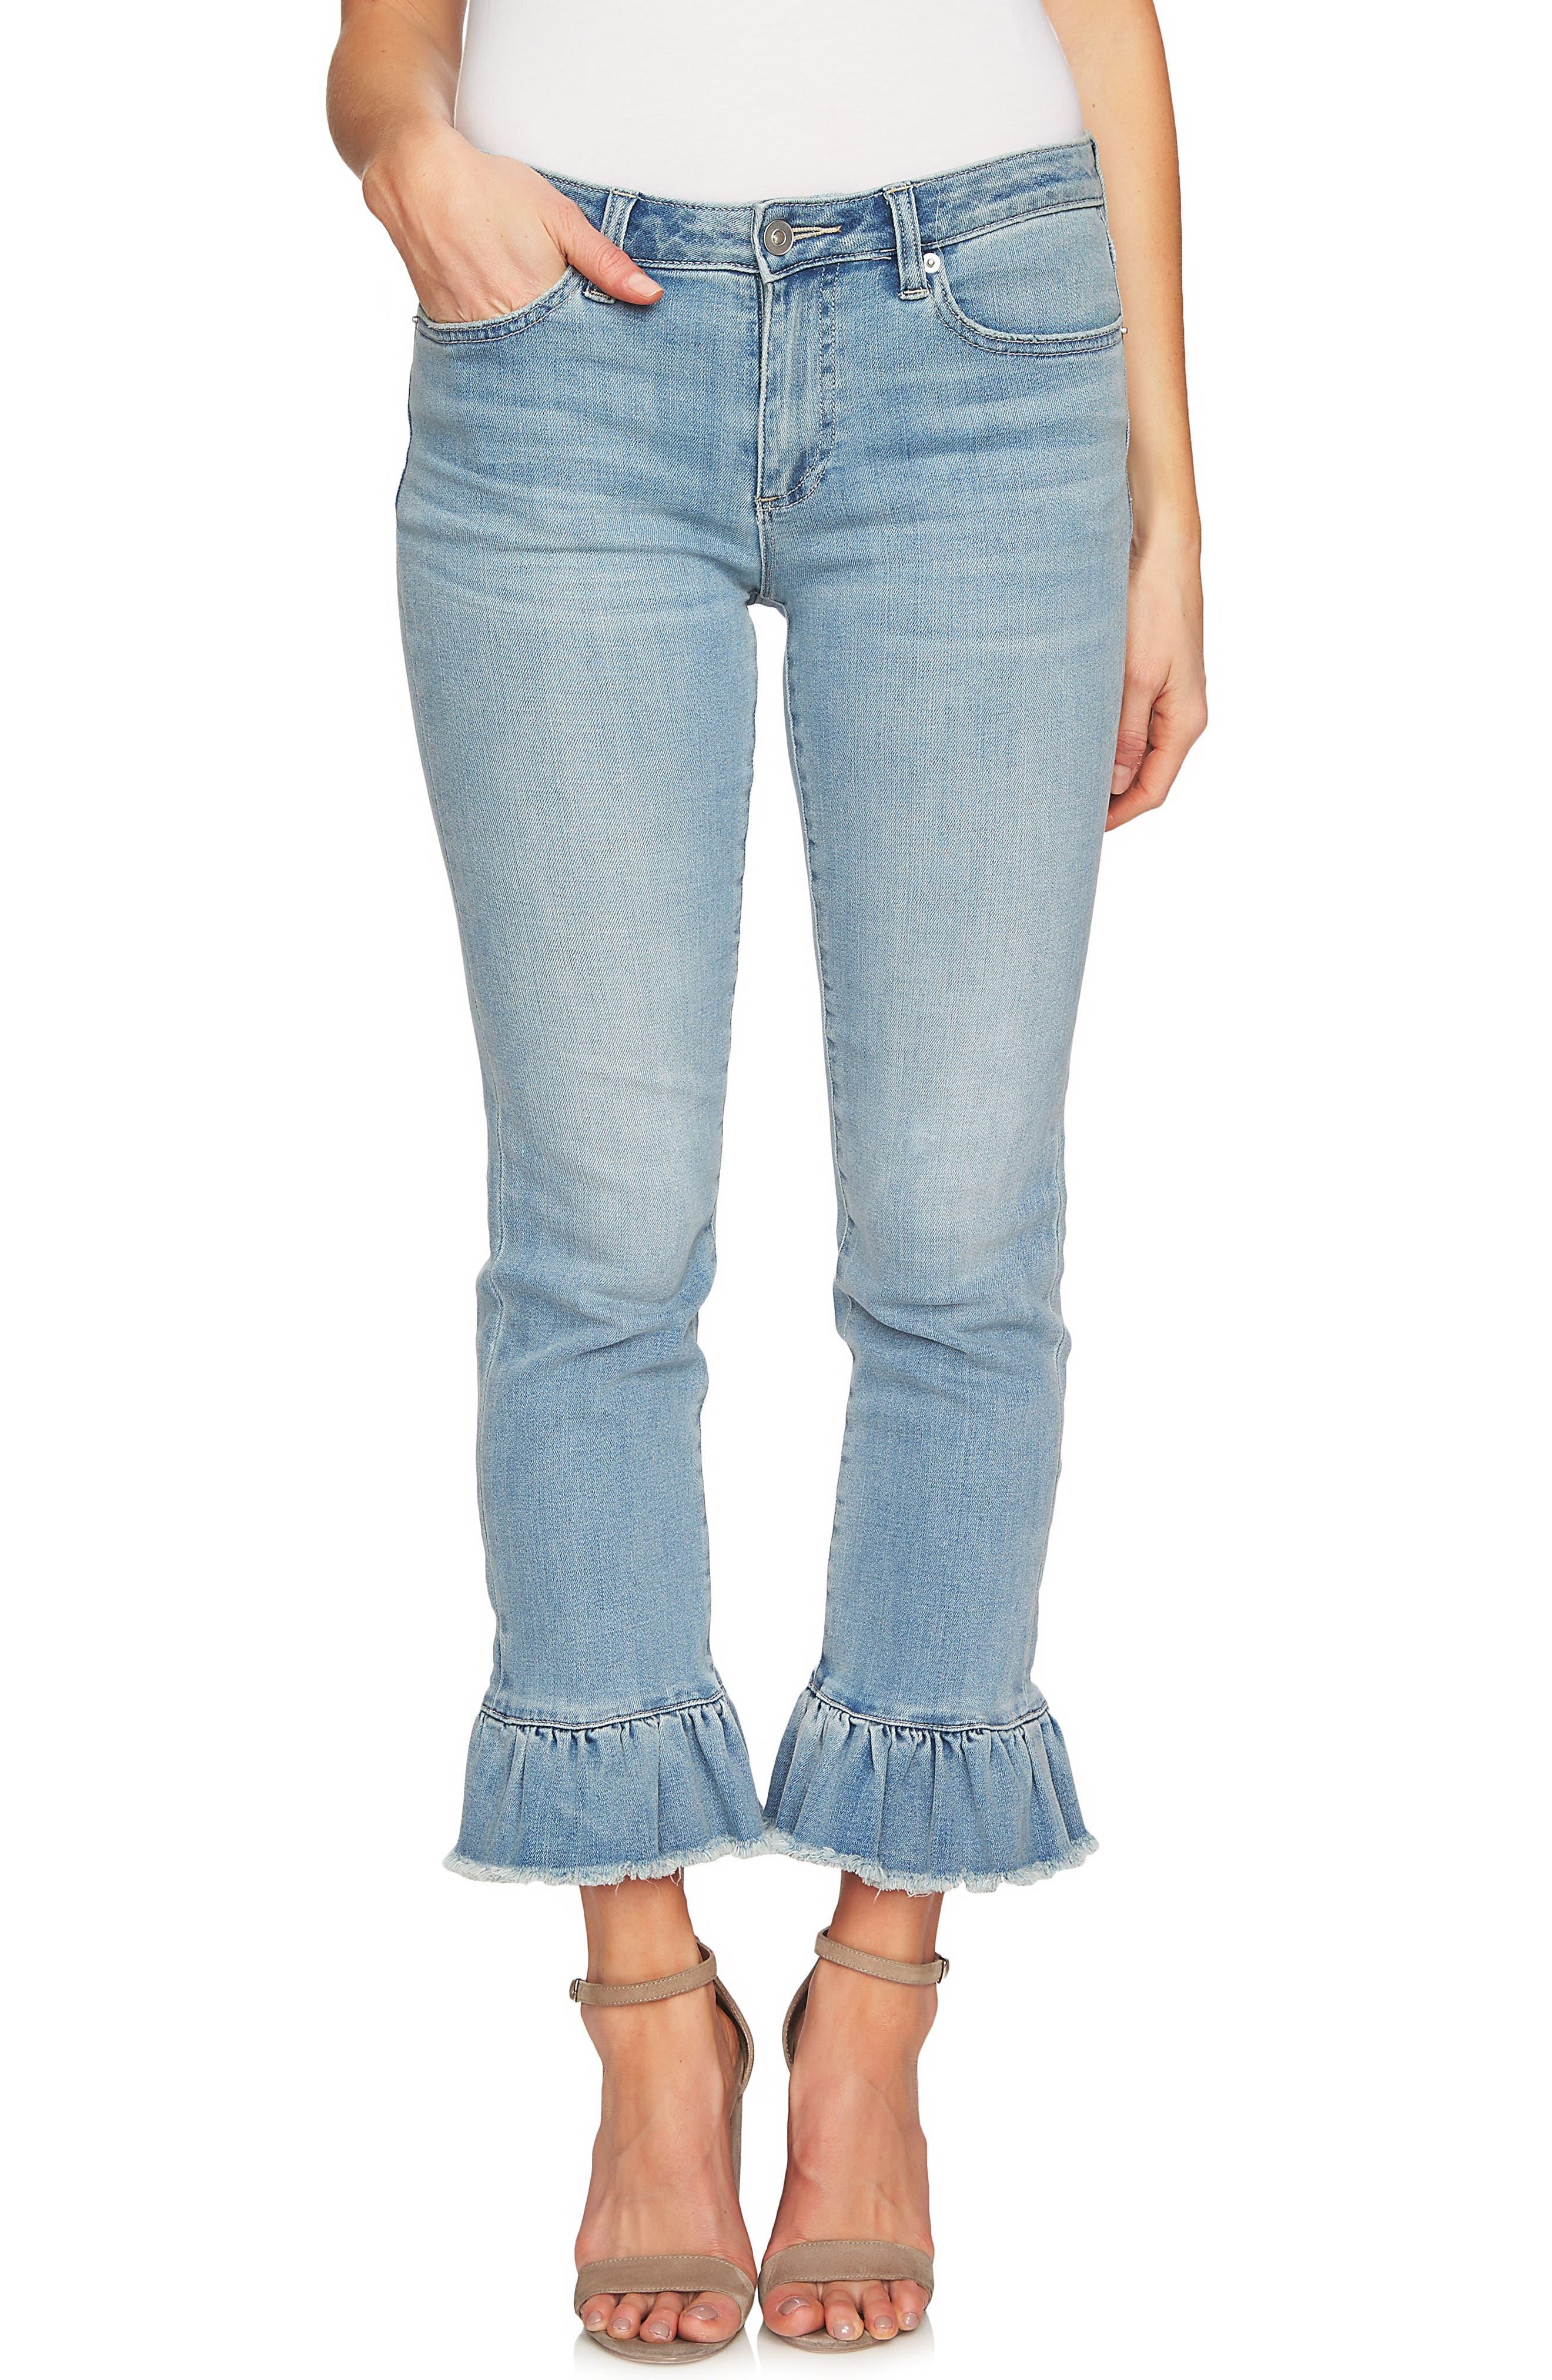 CeCe Ruffle Hem Ankle Jeans (Sun Washed Blue)